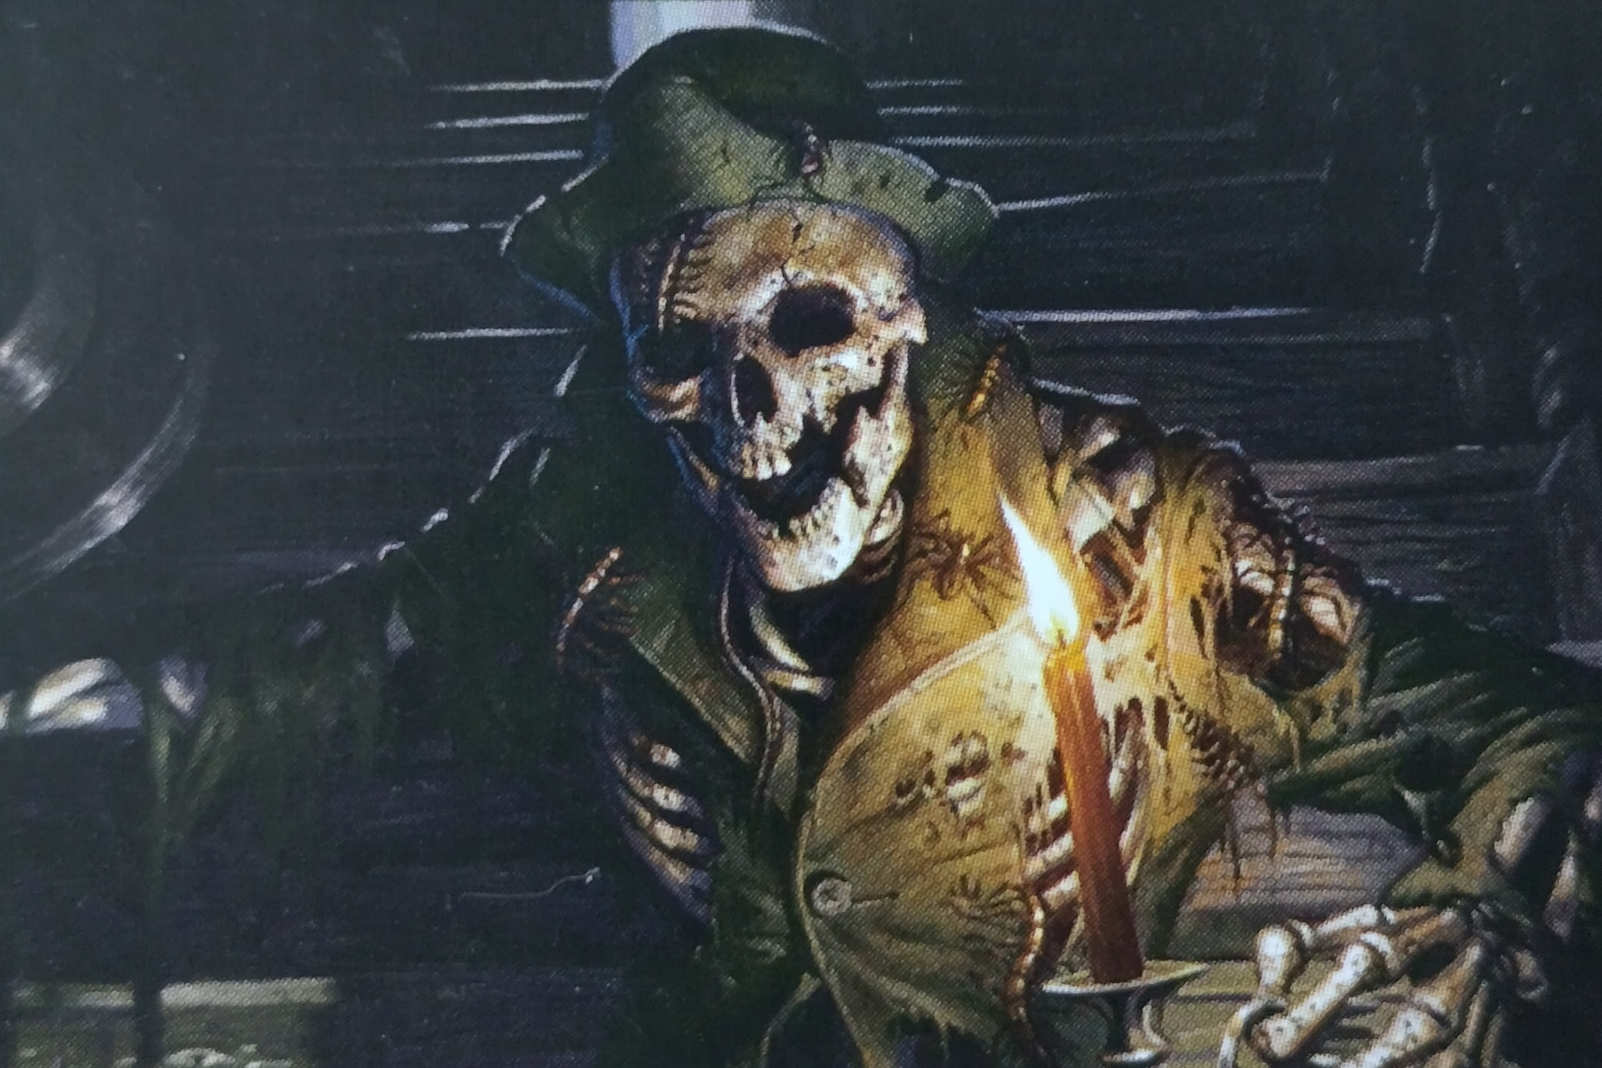 mtg card manor skeleton image wizards of the ocast. Artist Eric Deschamps